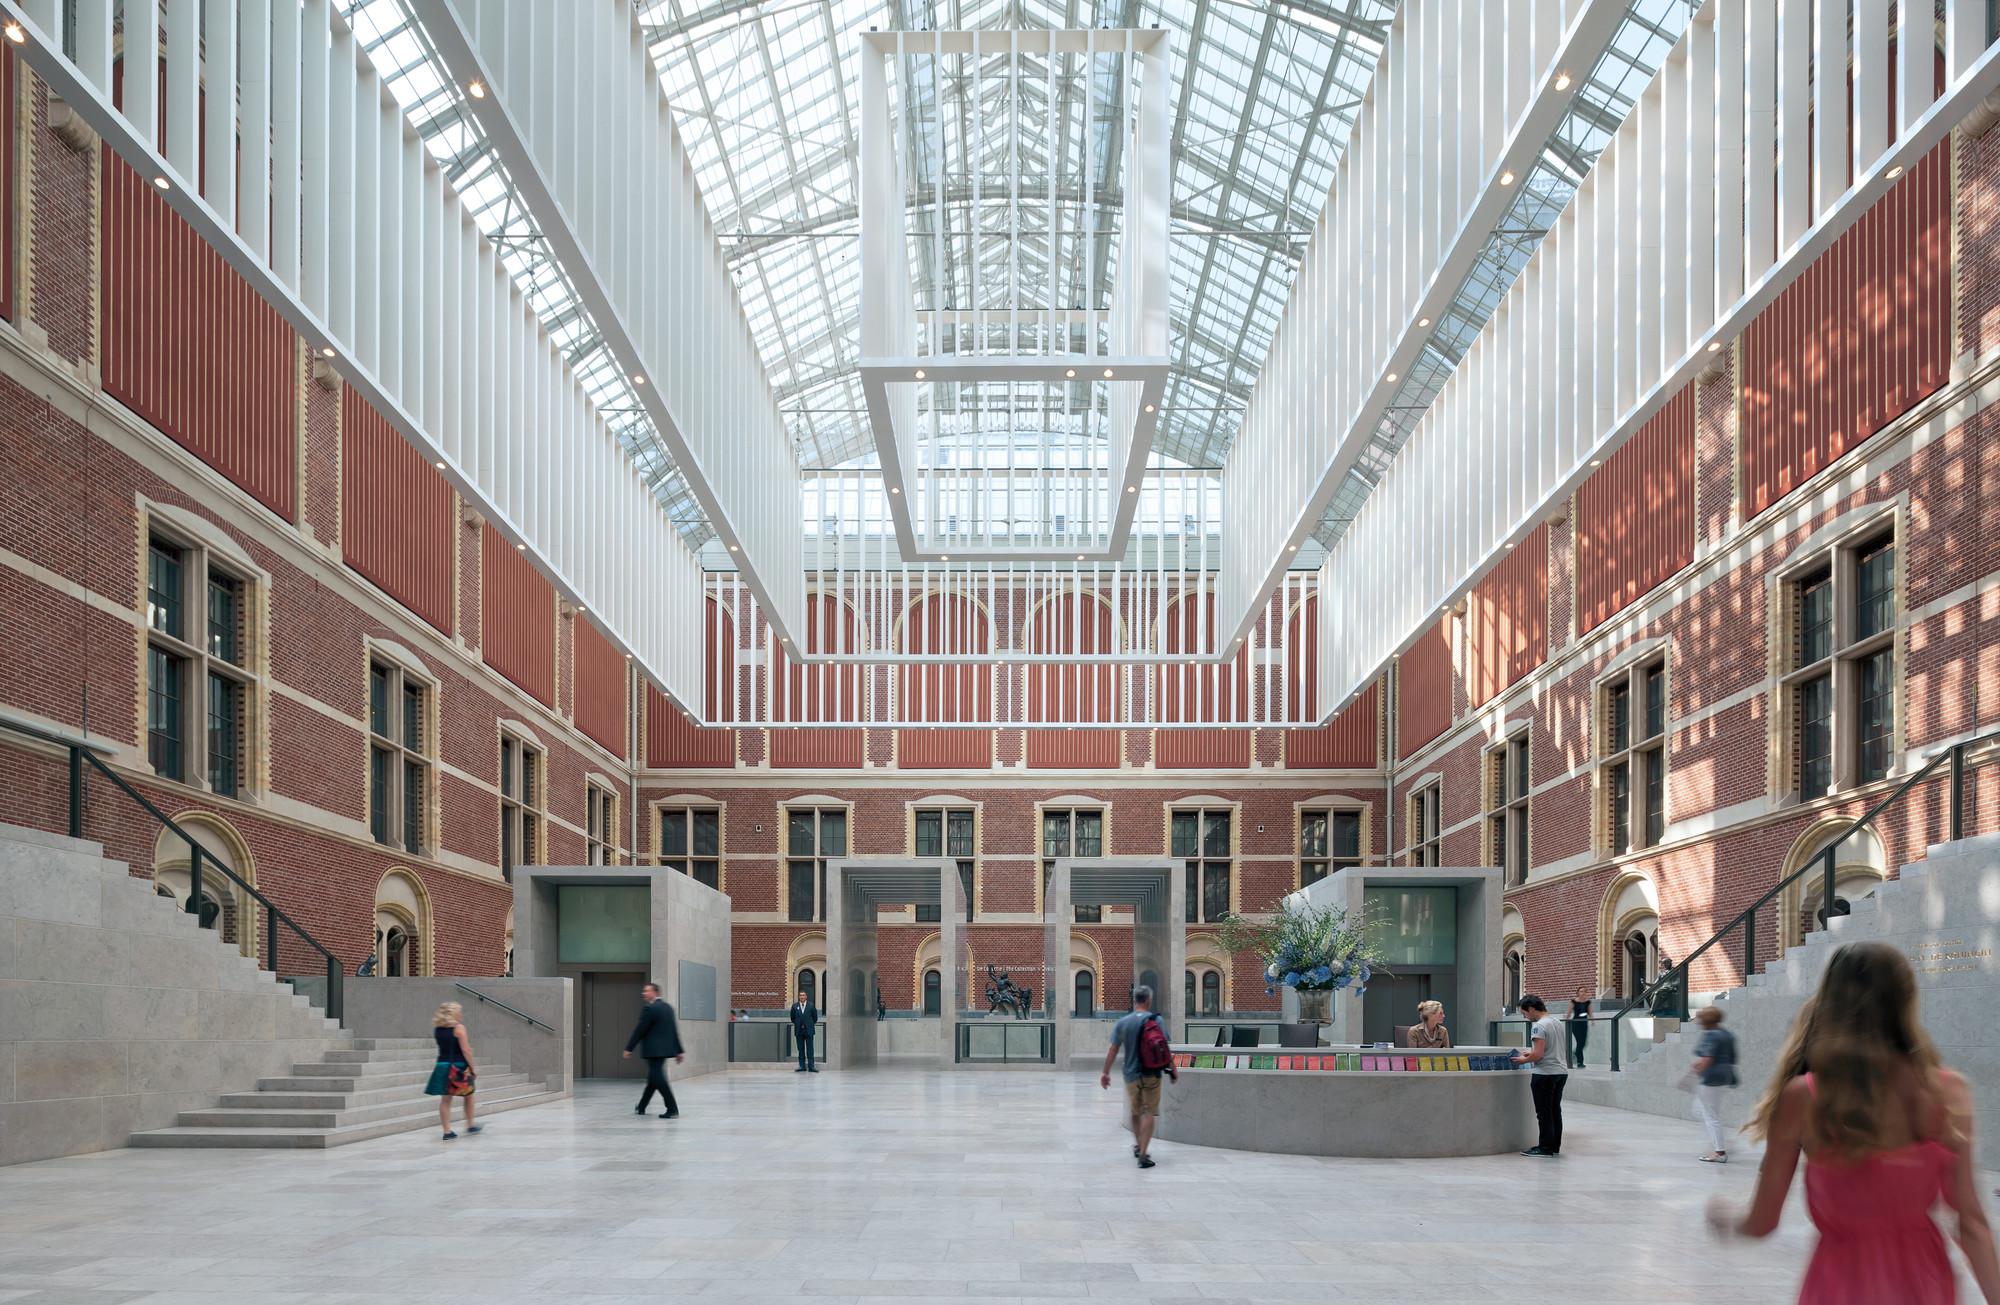 Rijksmuseum. Image © Duccio Malagamba